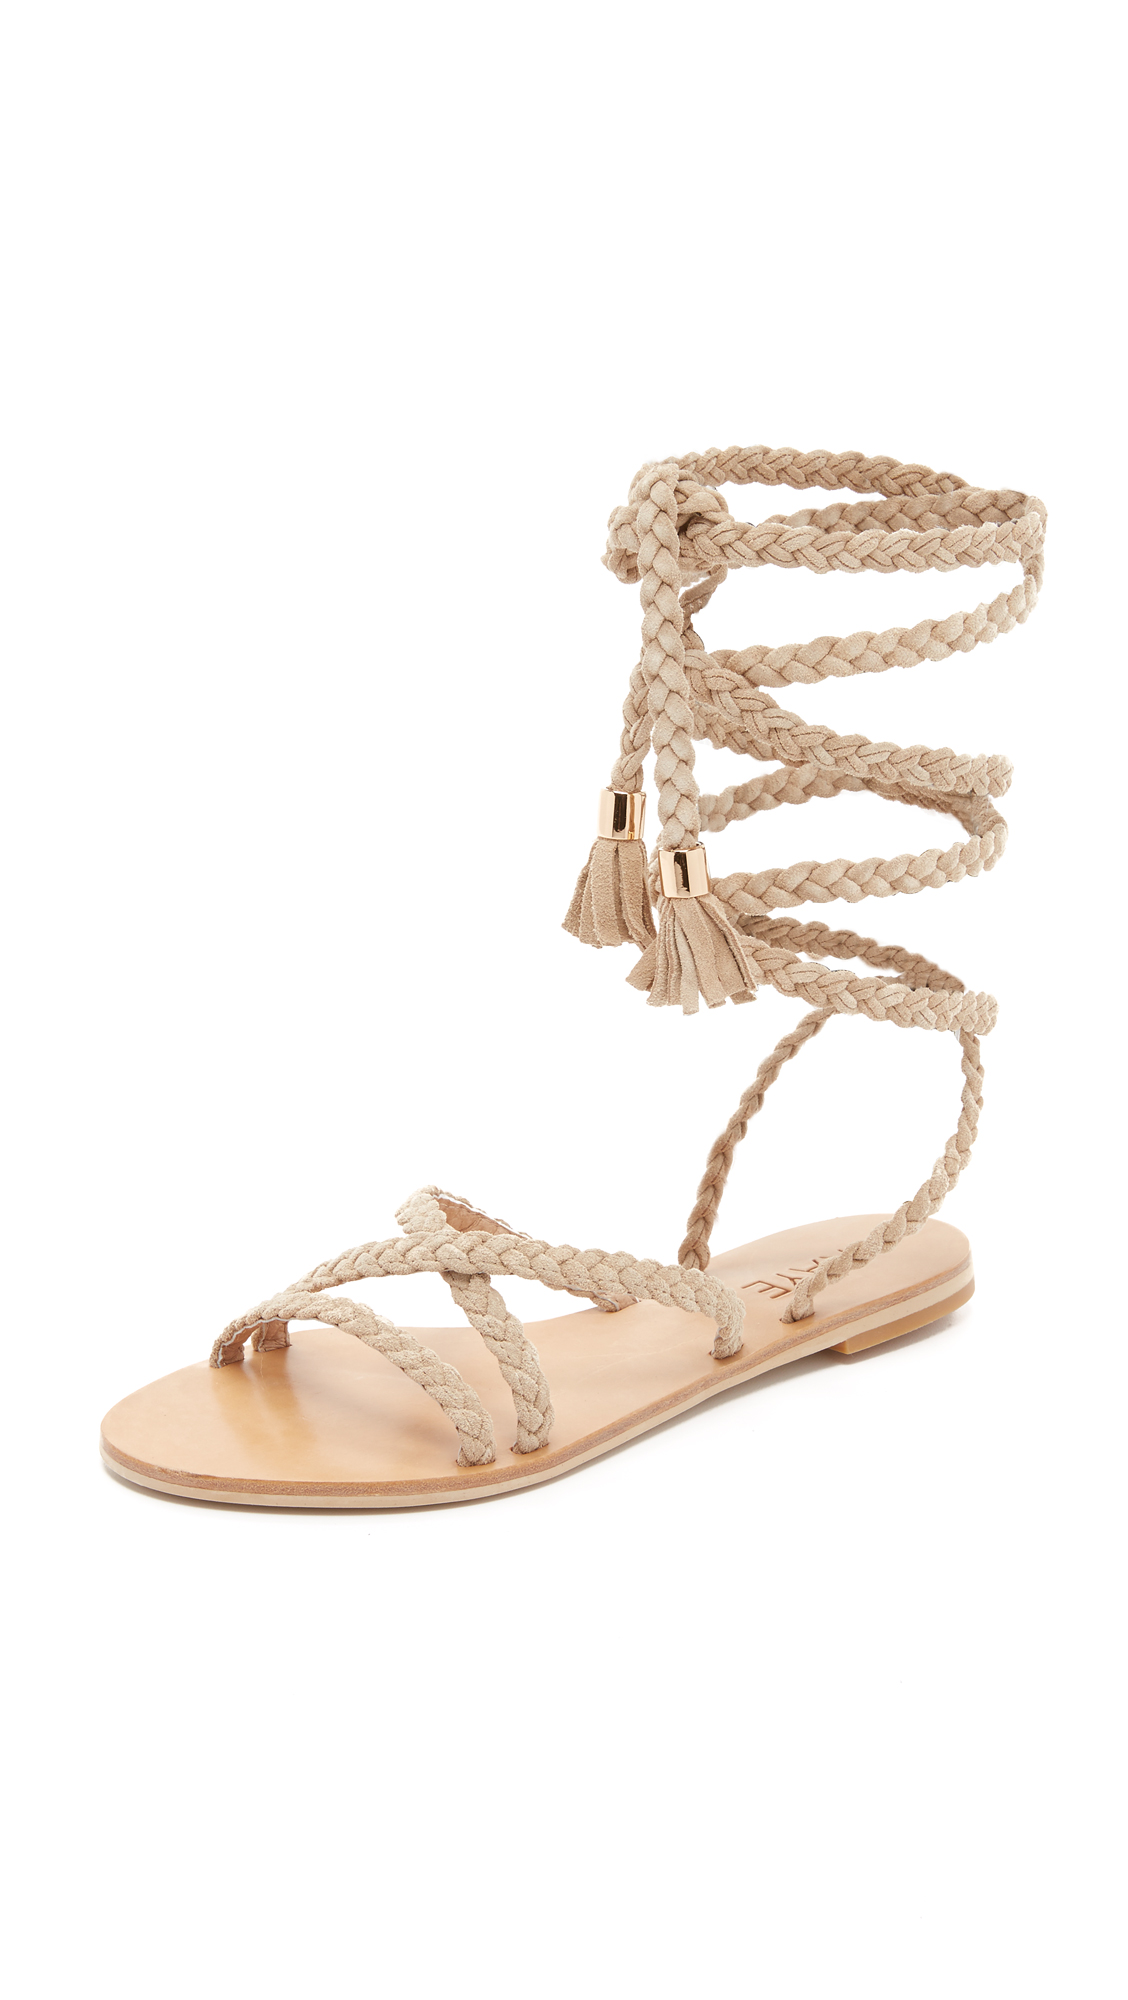 aa0d63e249b Raye Sadie Gladiator Sandals